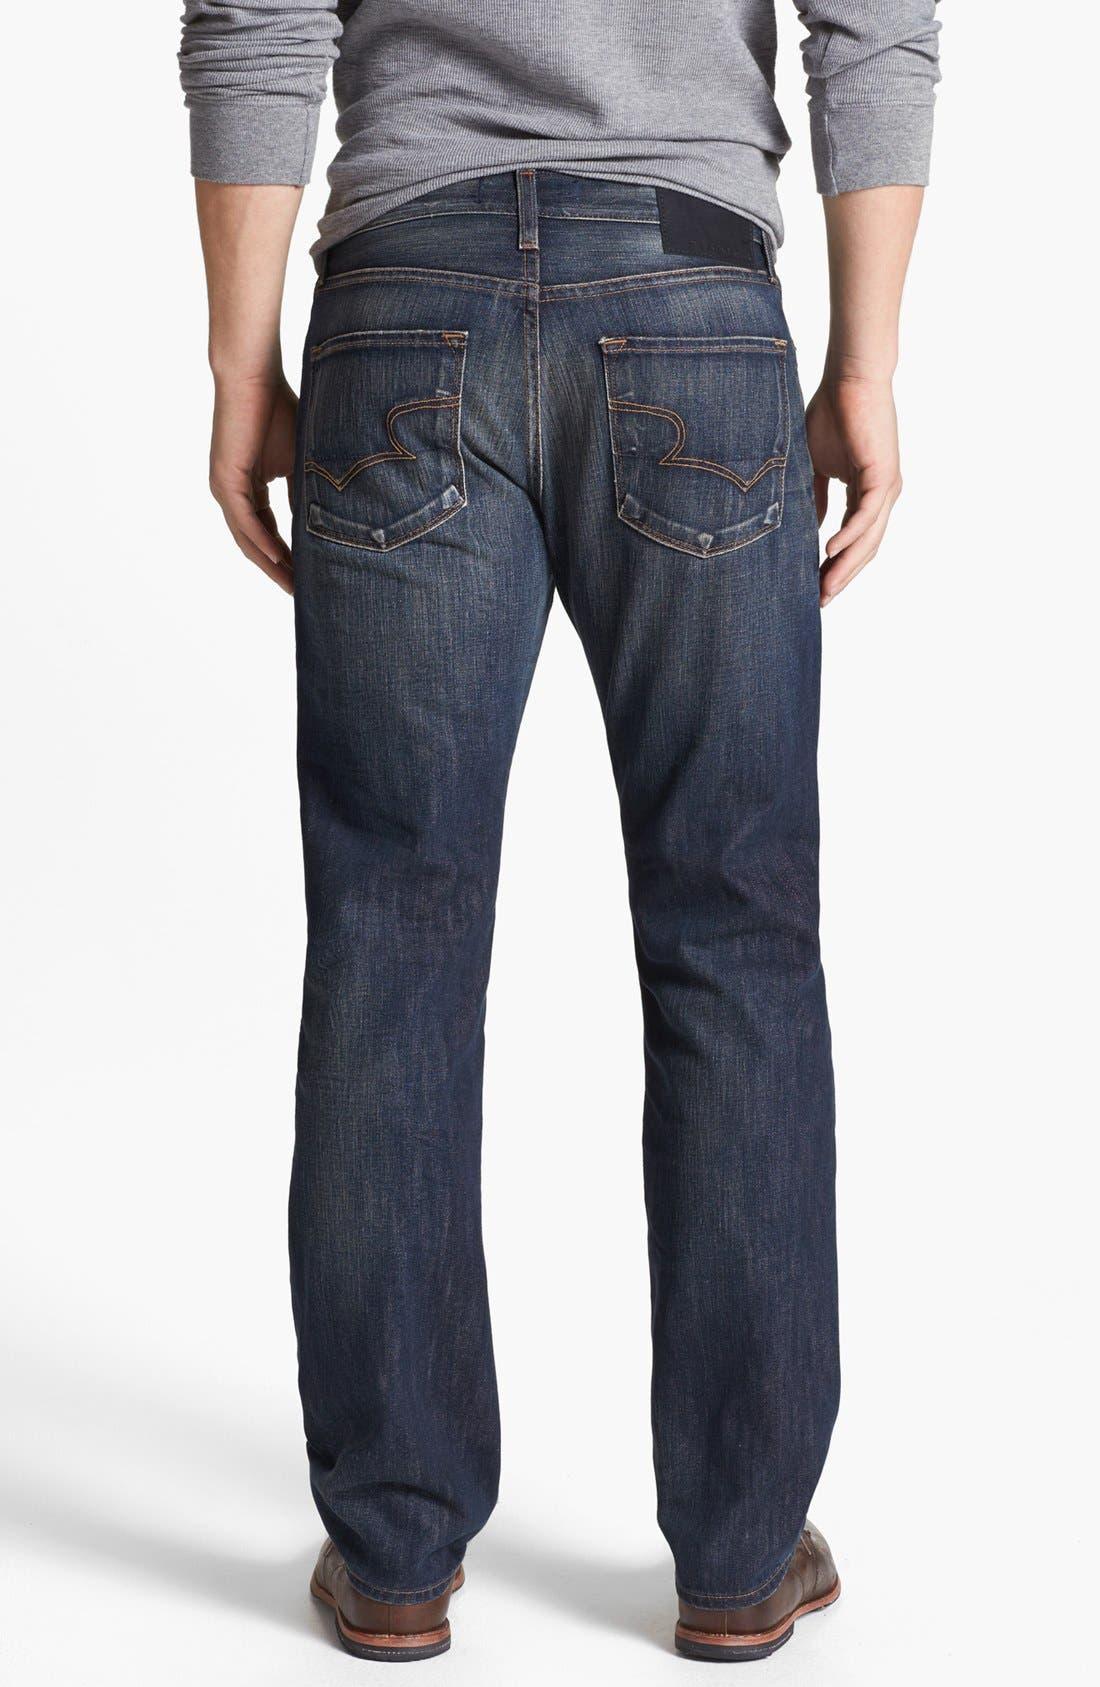 Alternate Image 2  - Big Star 'Division' Straight Leg Jeans (6 Year Piston)